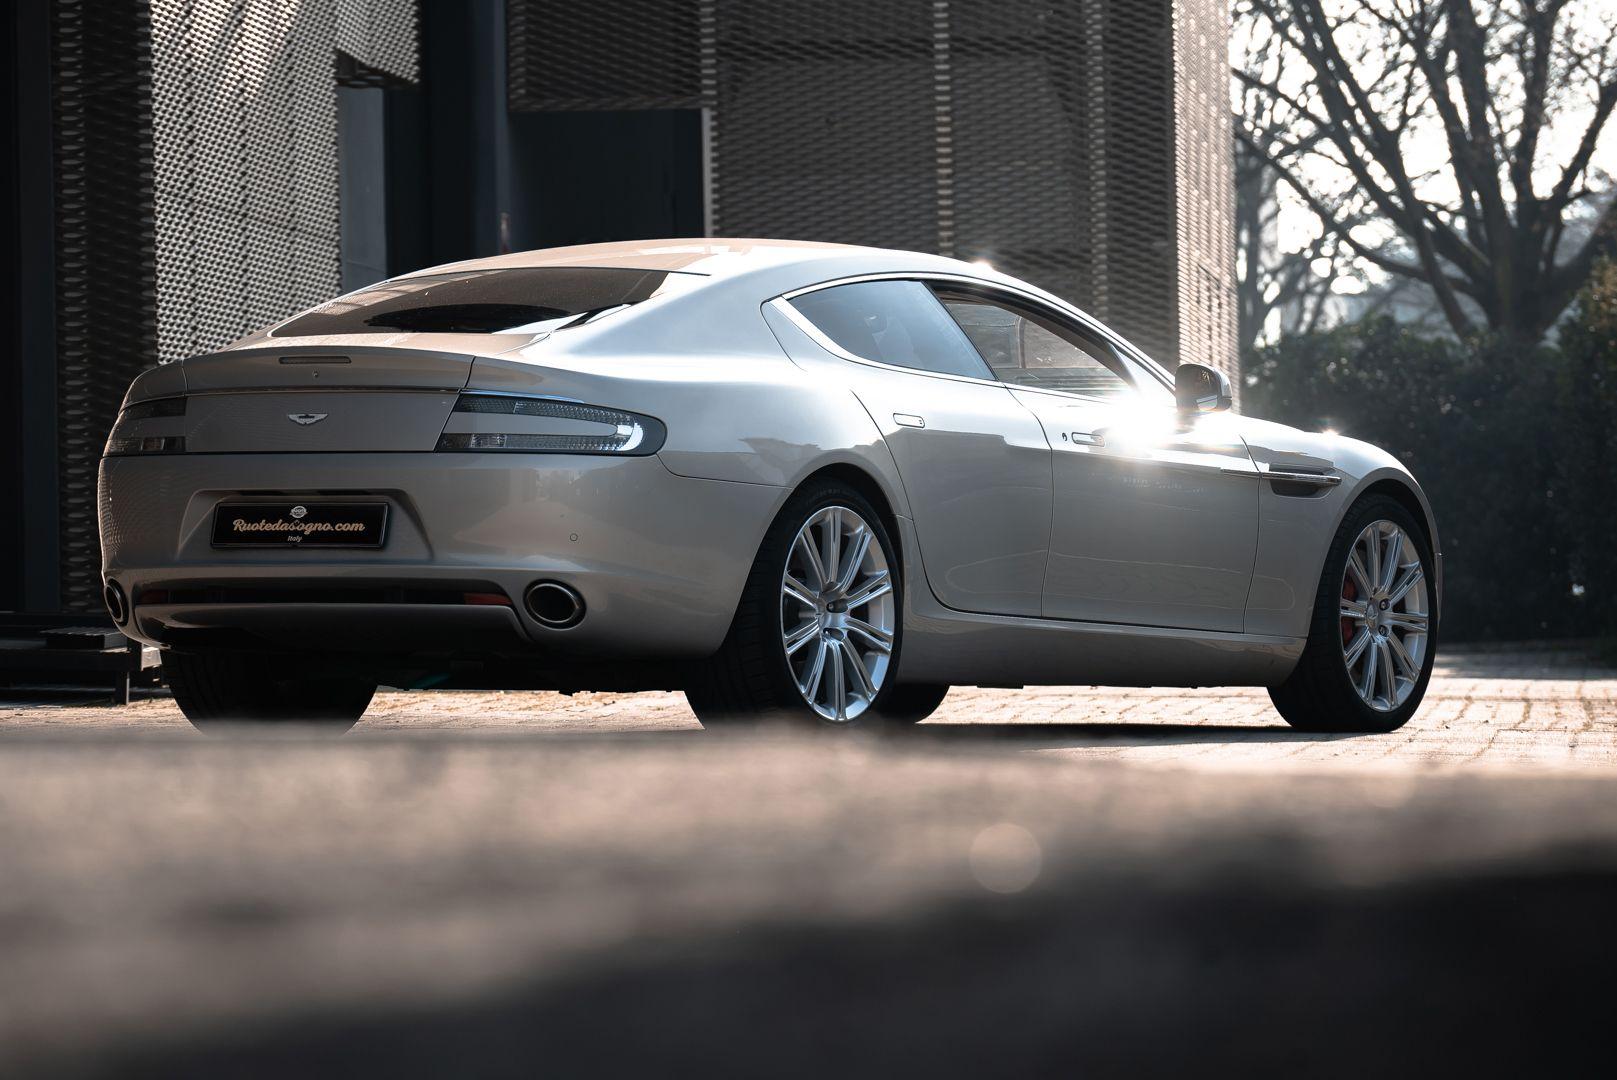 2010 Aston Martin Rapide 6.0 V12 62554